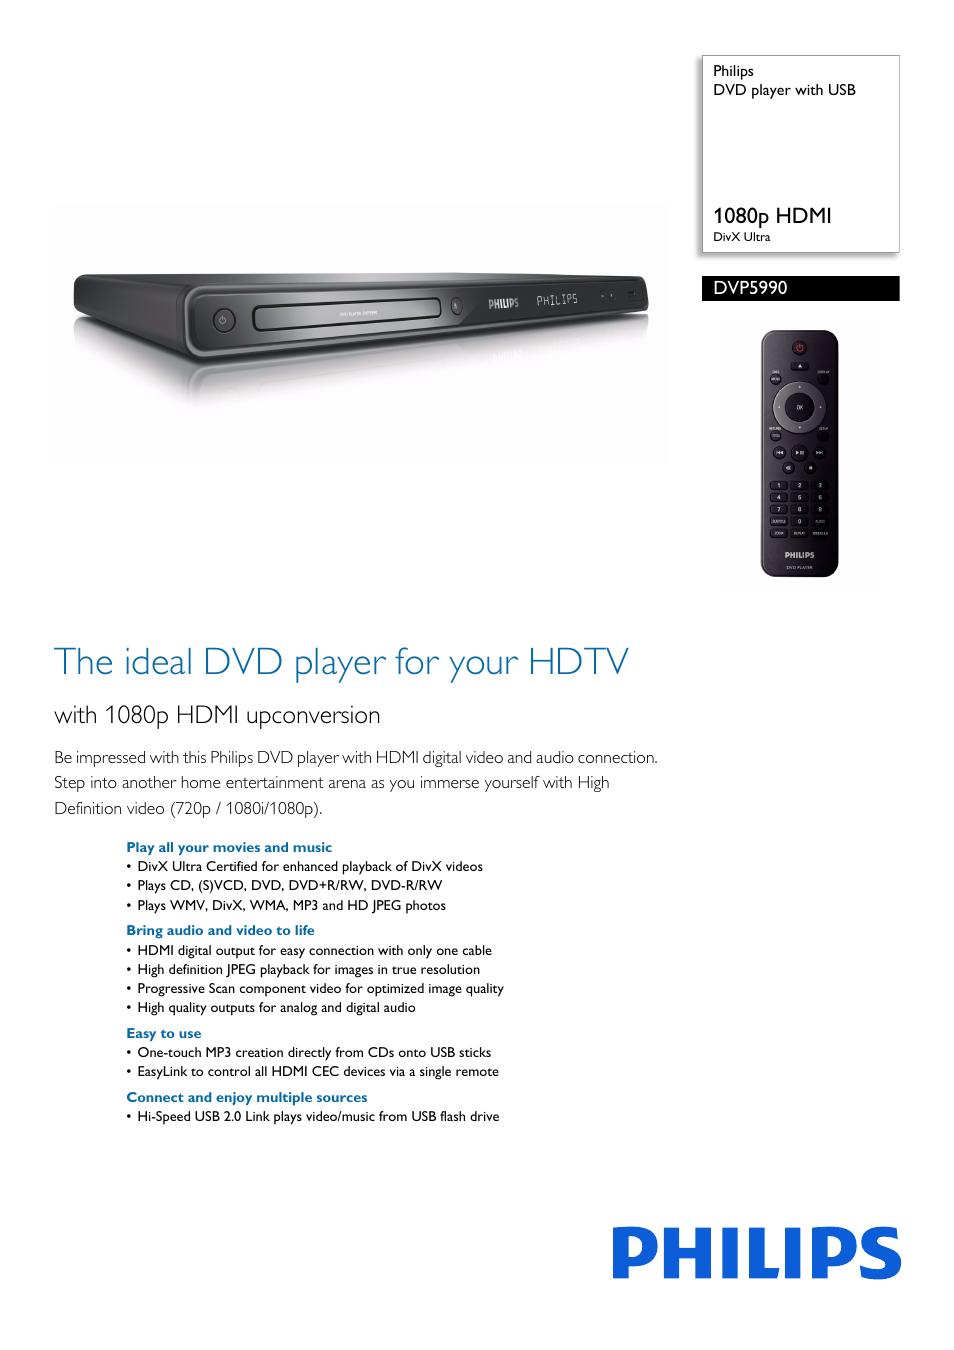 philips dvp5990 f7 user manual 3 pages also for dvp5990 f7b rh manualsdir com DVD Player Philips Dvp598 DVD Player Philips Dvp598